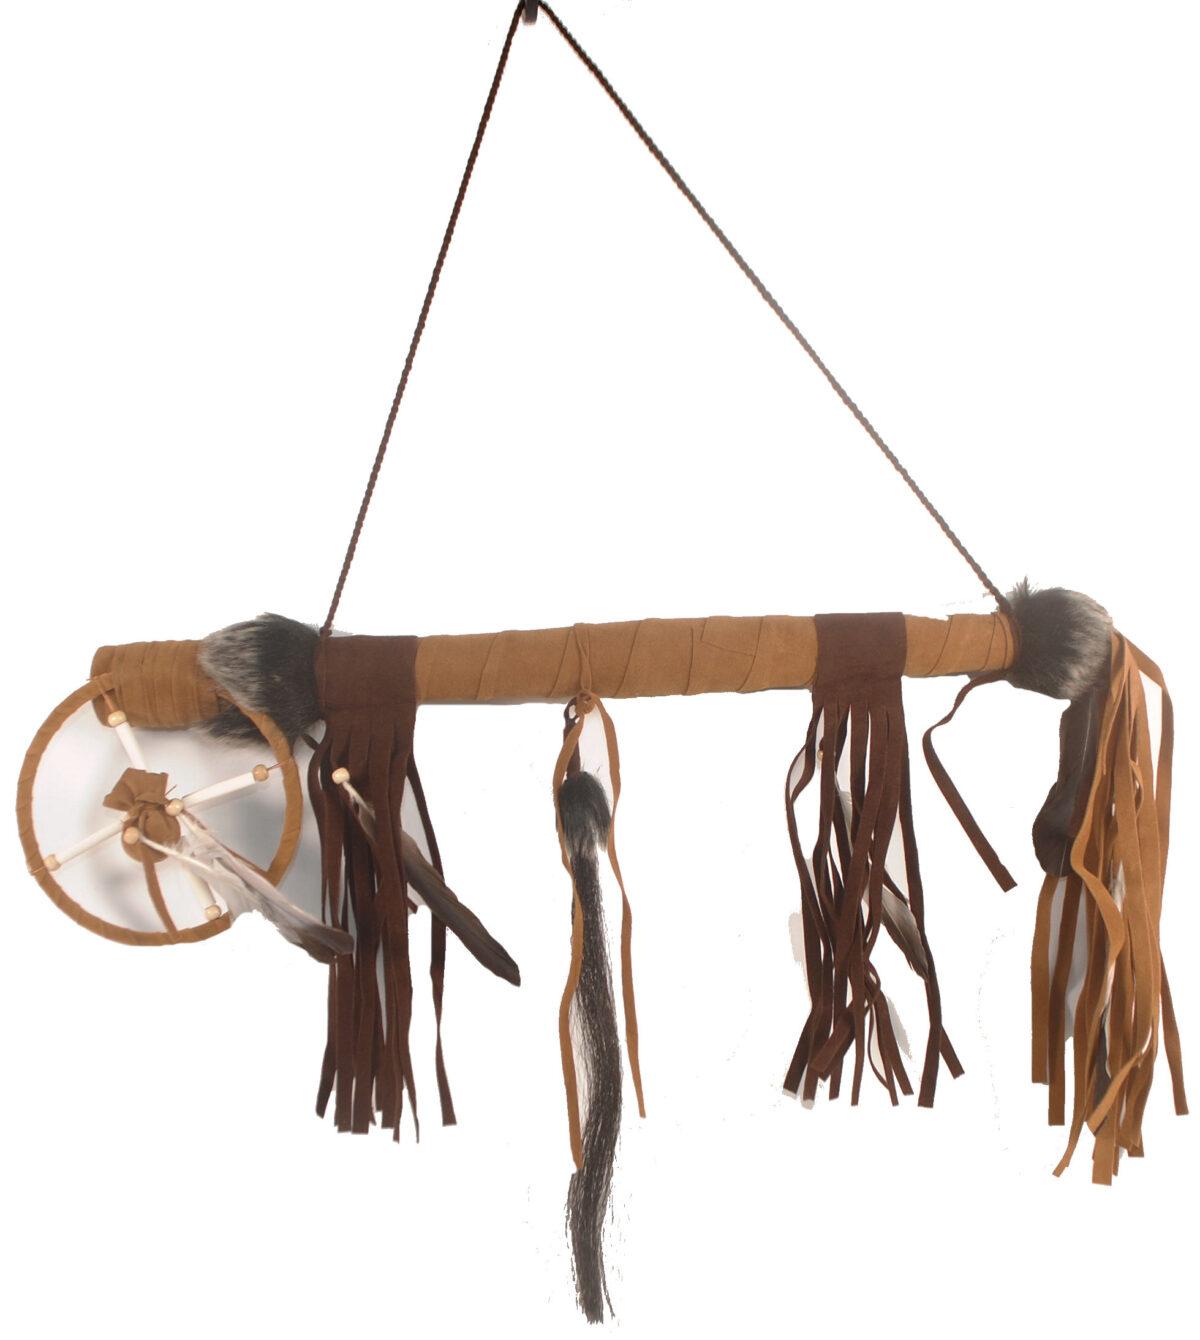 shaman stick